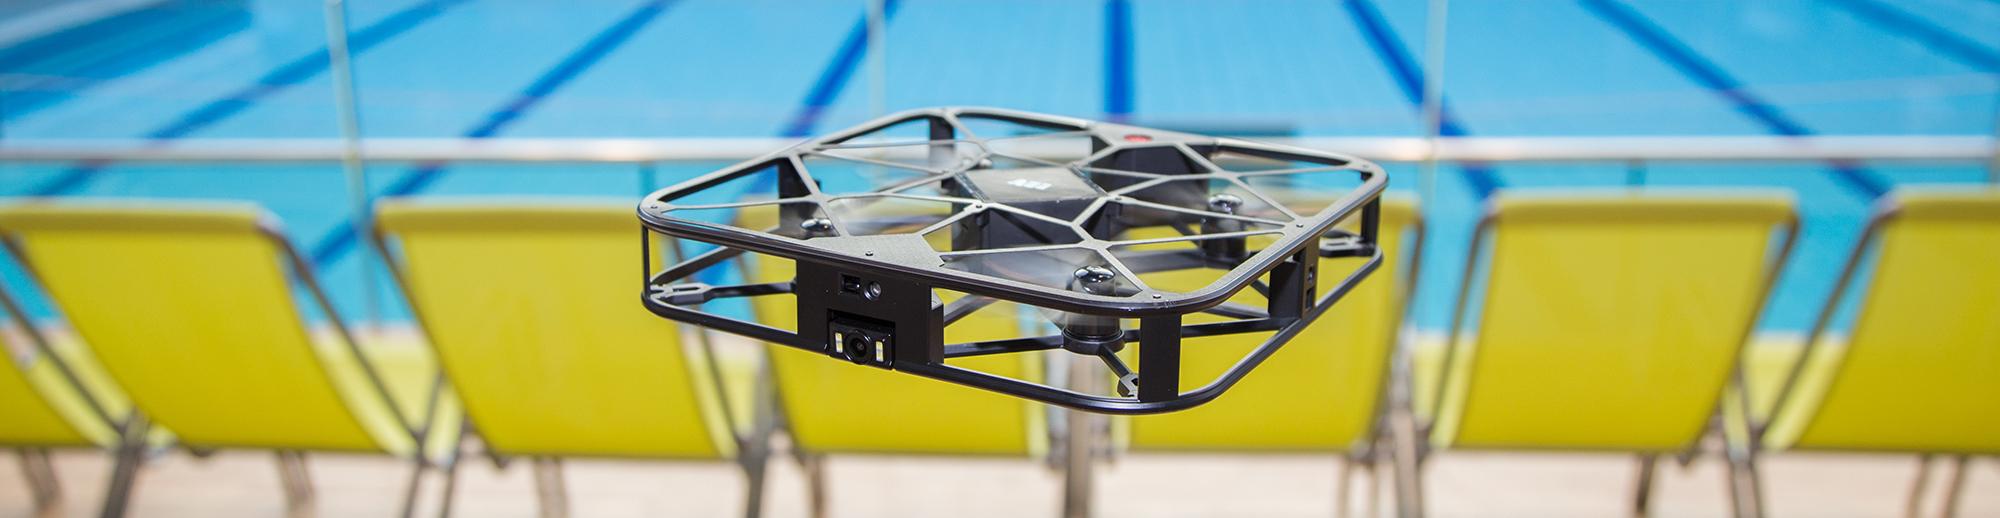 Drone Sparrow 360 AEE